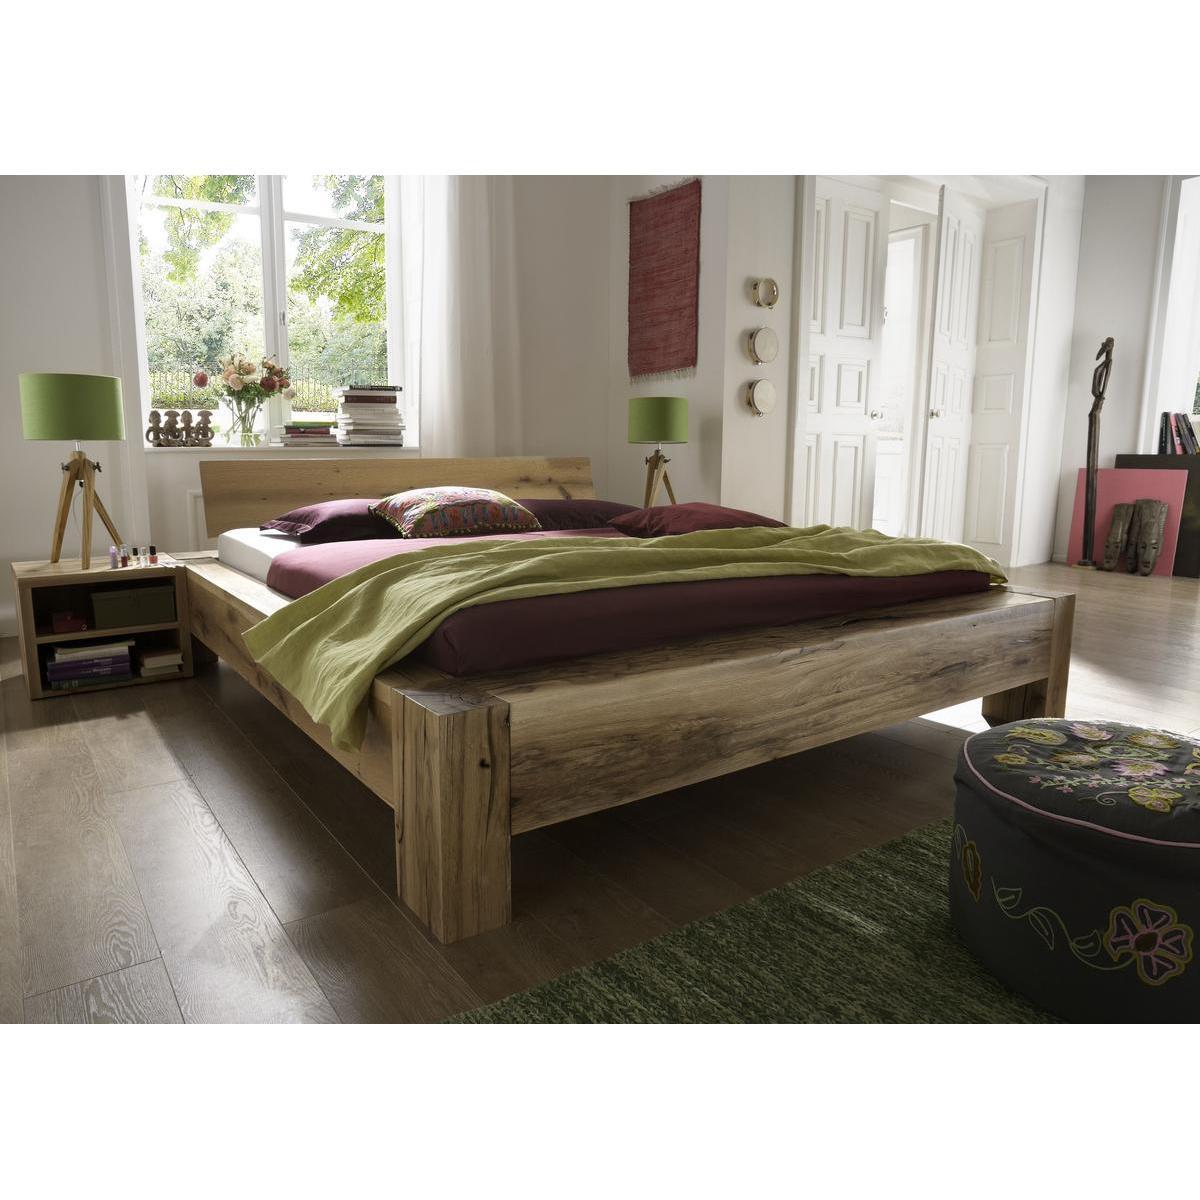 echtholz balkenbett 200x200 heavy sleep alba wildeiche massiv natur ge lt 2220 26 2110 3. Black Bedroom Furniture Sets. Home Design Ideas